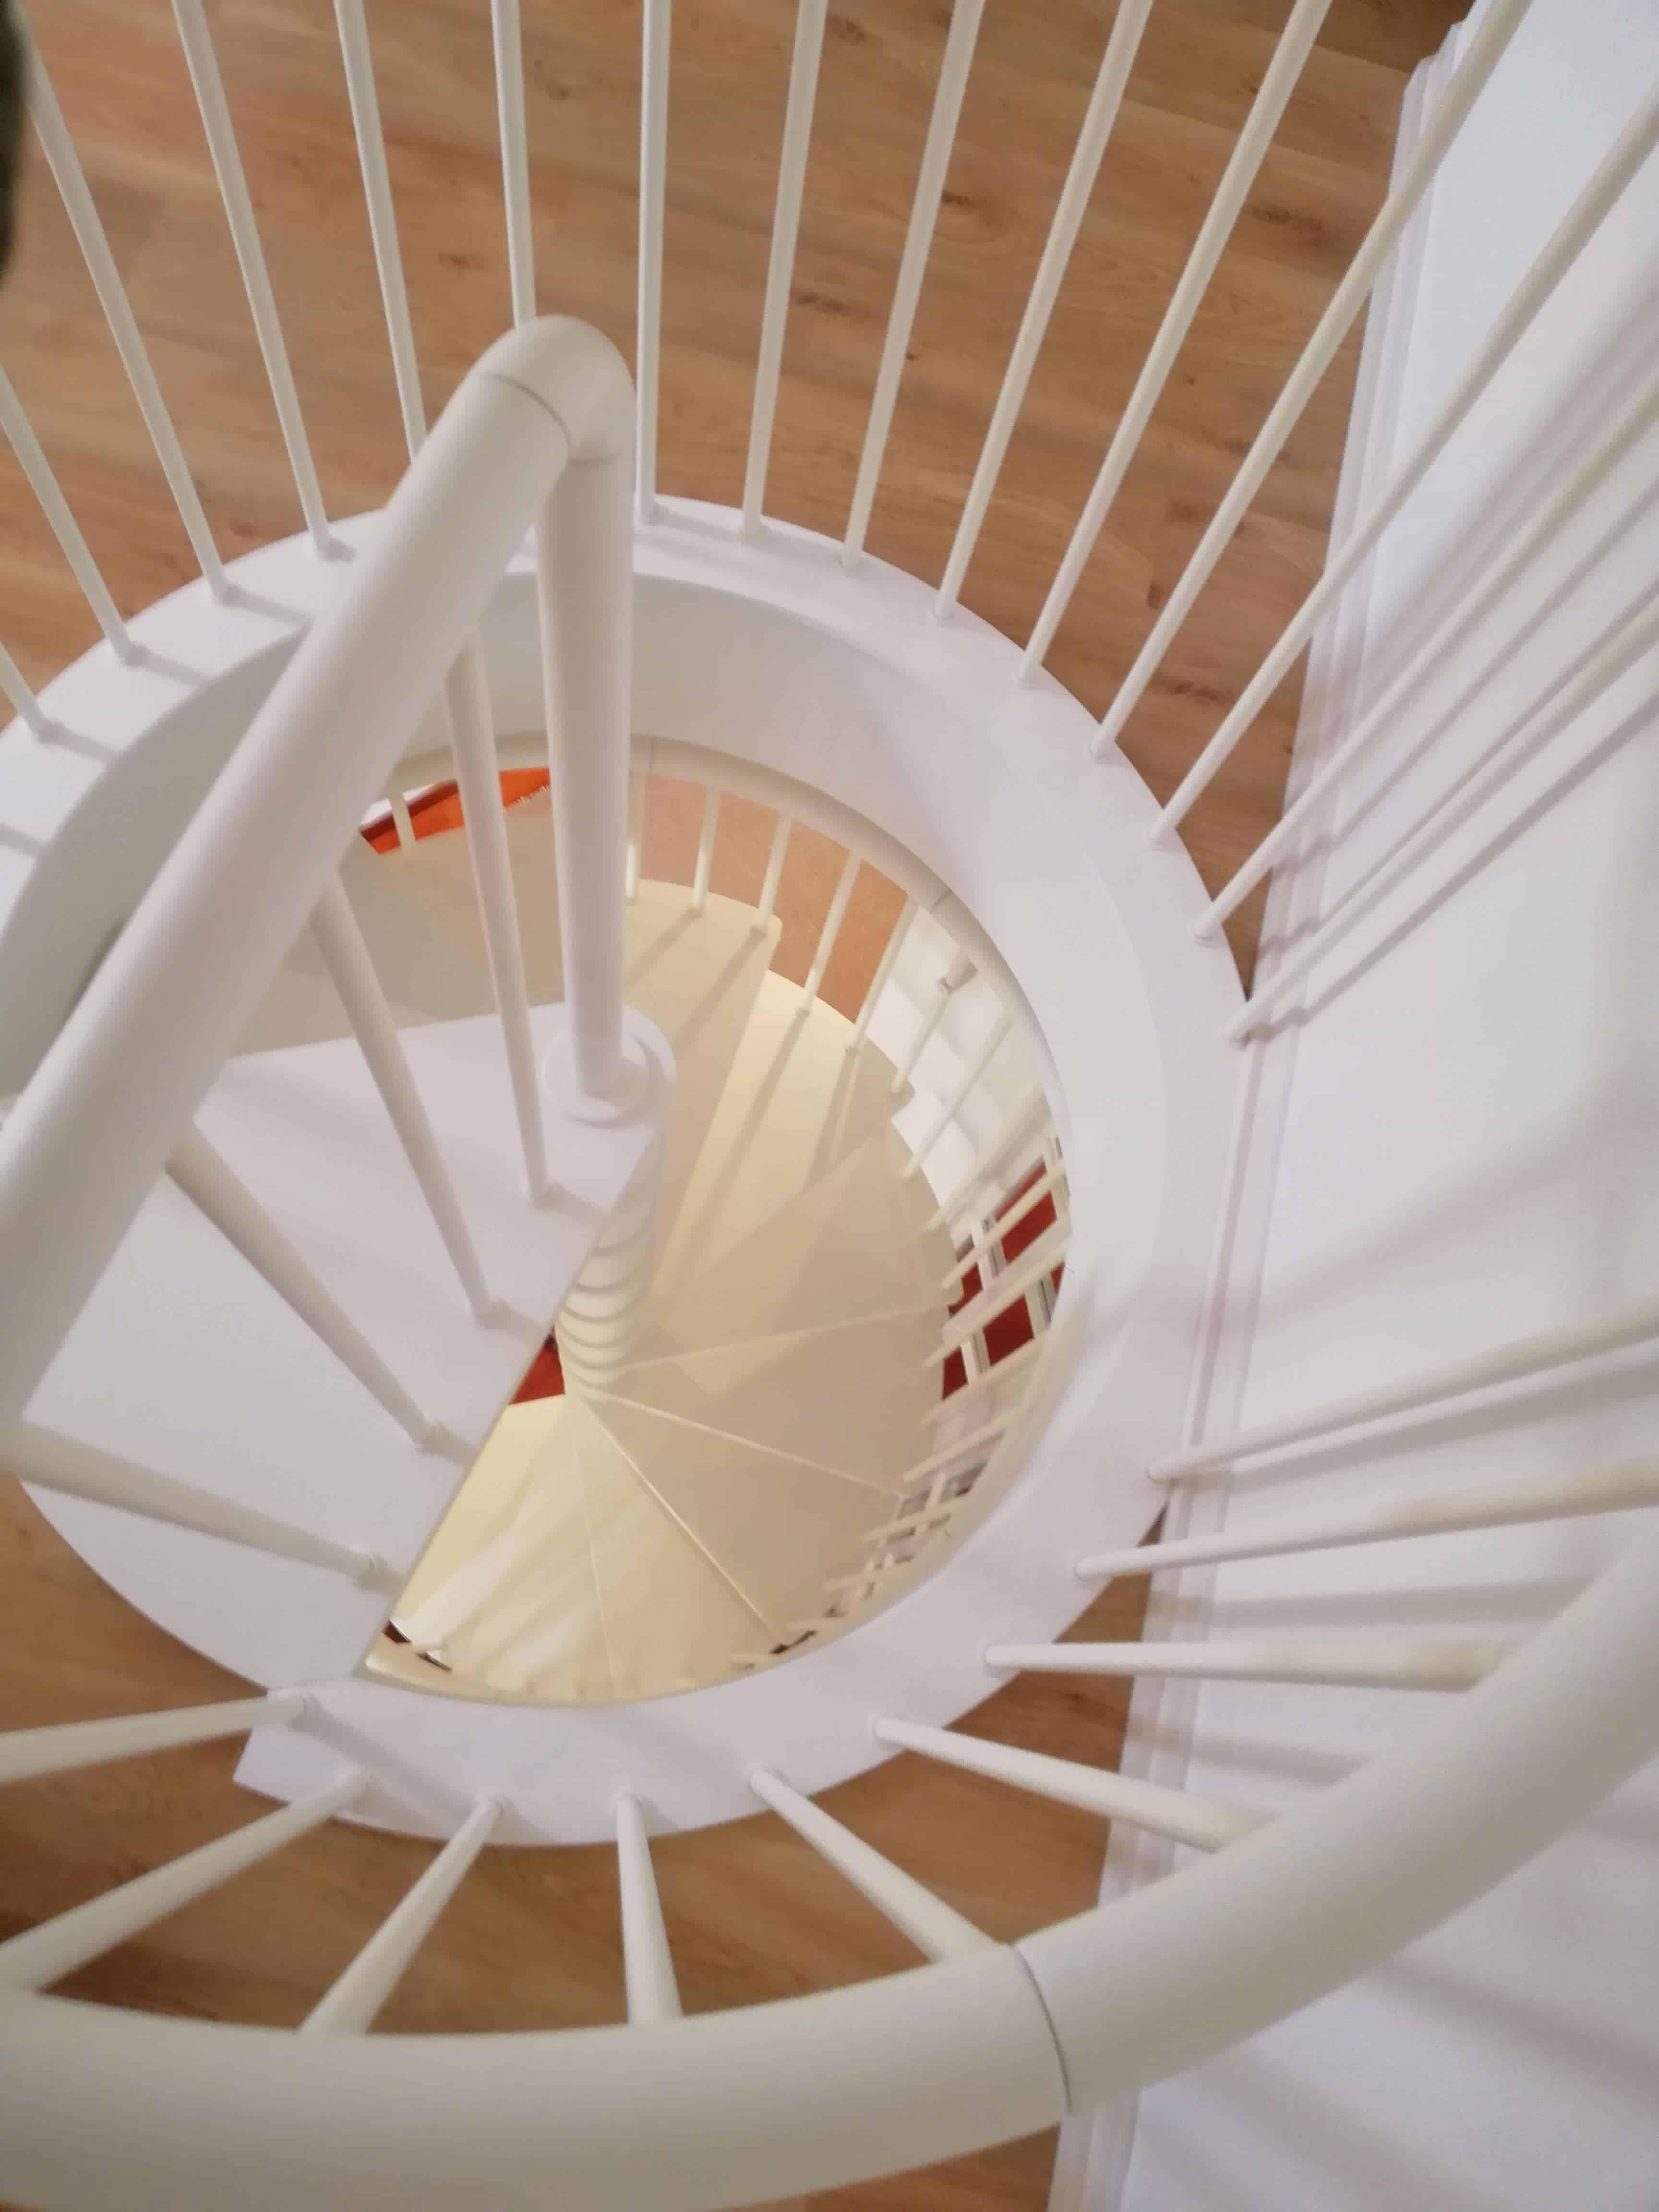 Barandilla metálica para hueco de una escalera de caracol